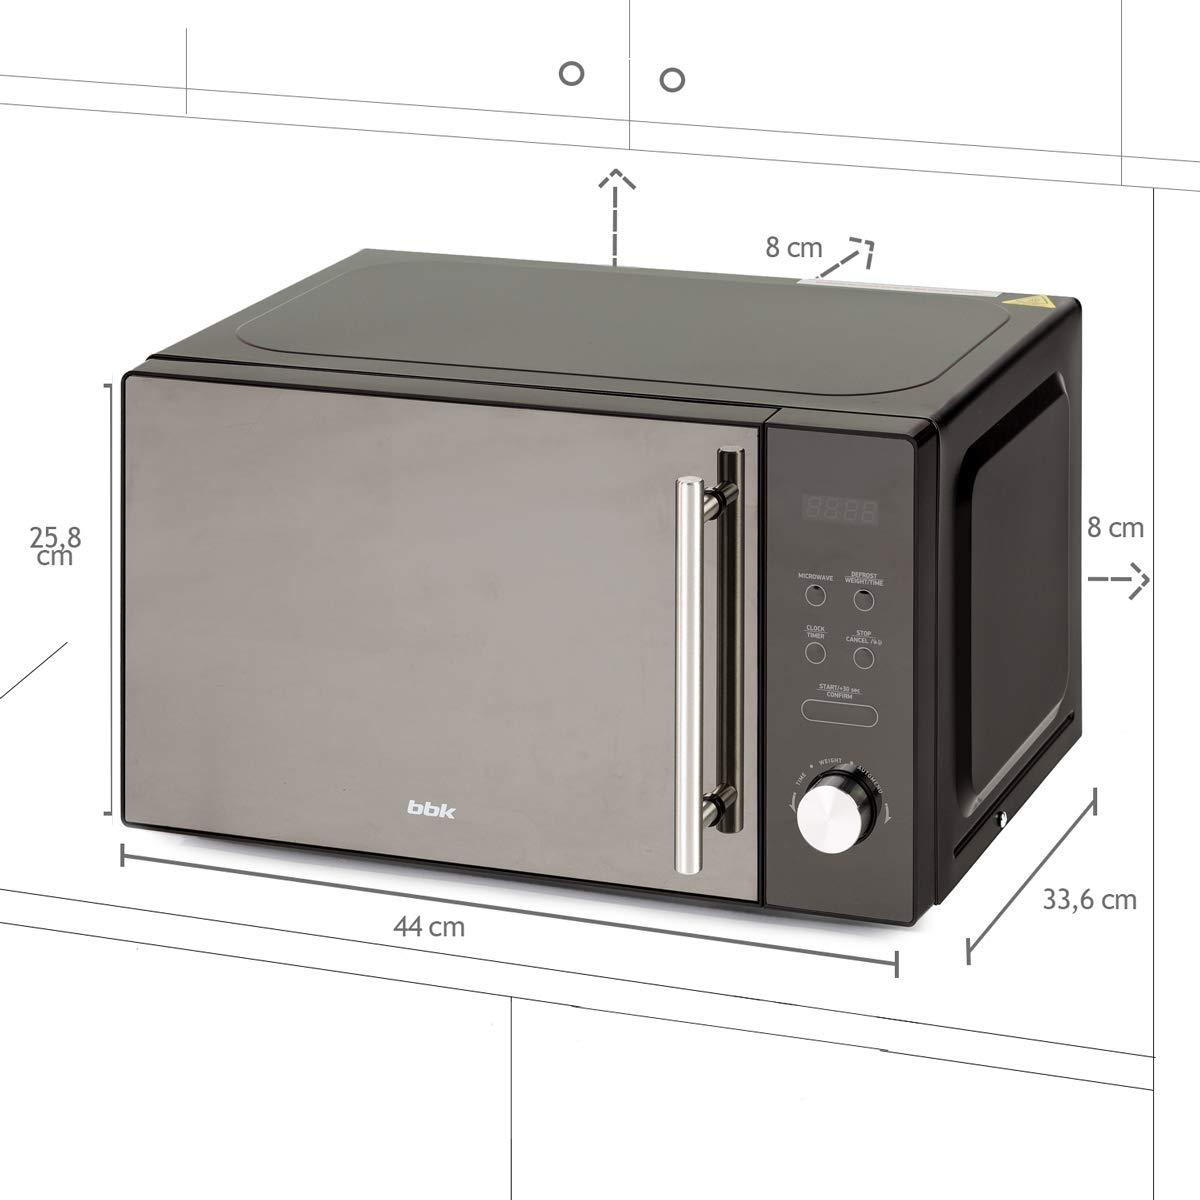 BBK 20MWS-722T/B-M Microondas Controles Electrónicos con Puerta ...